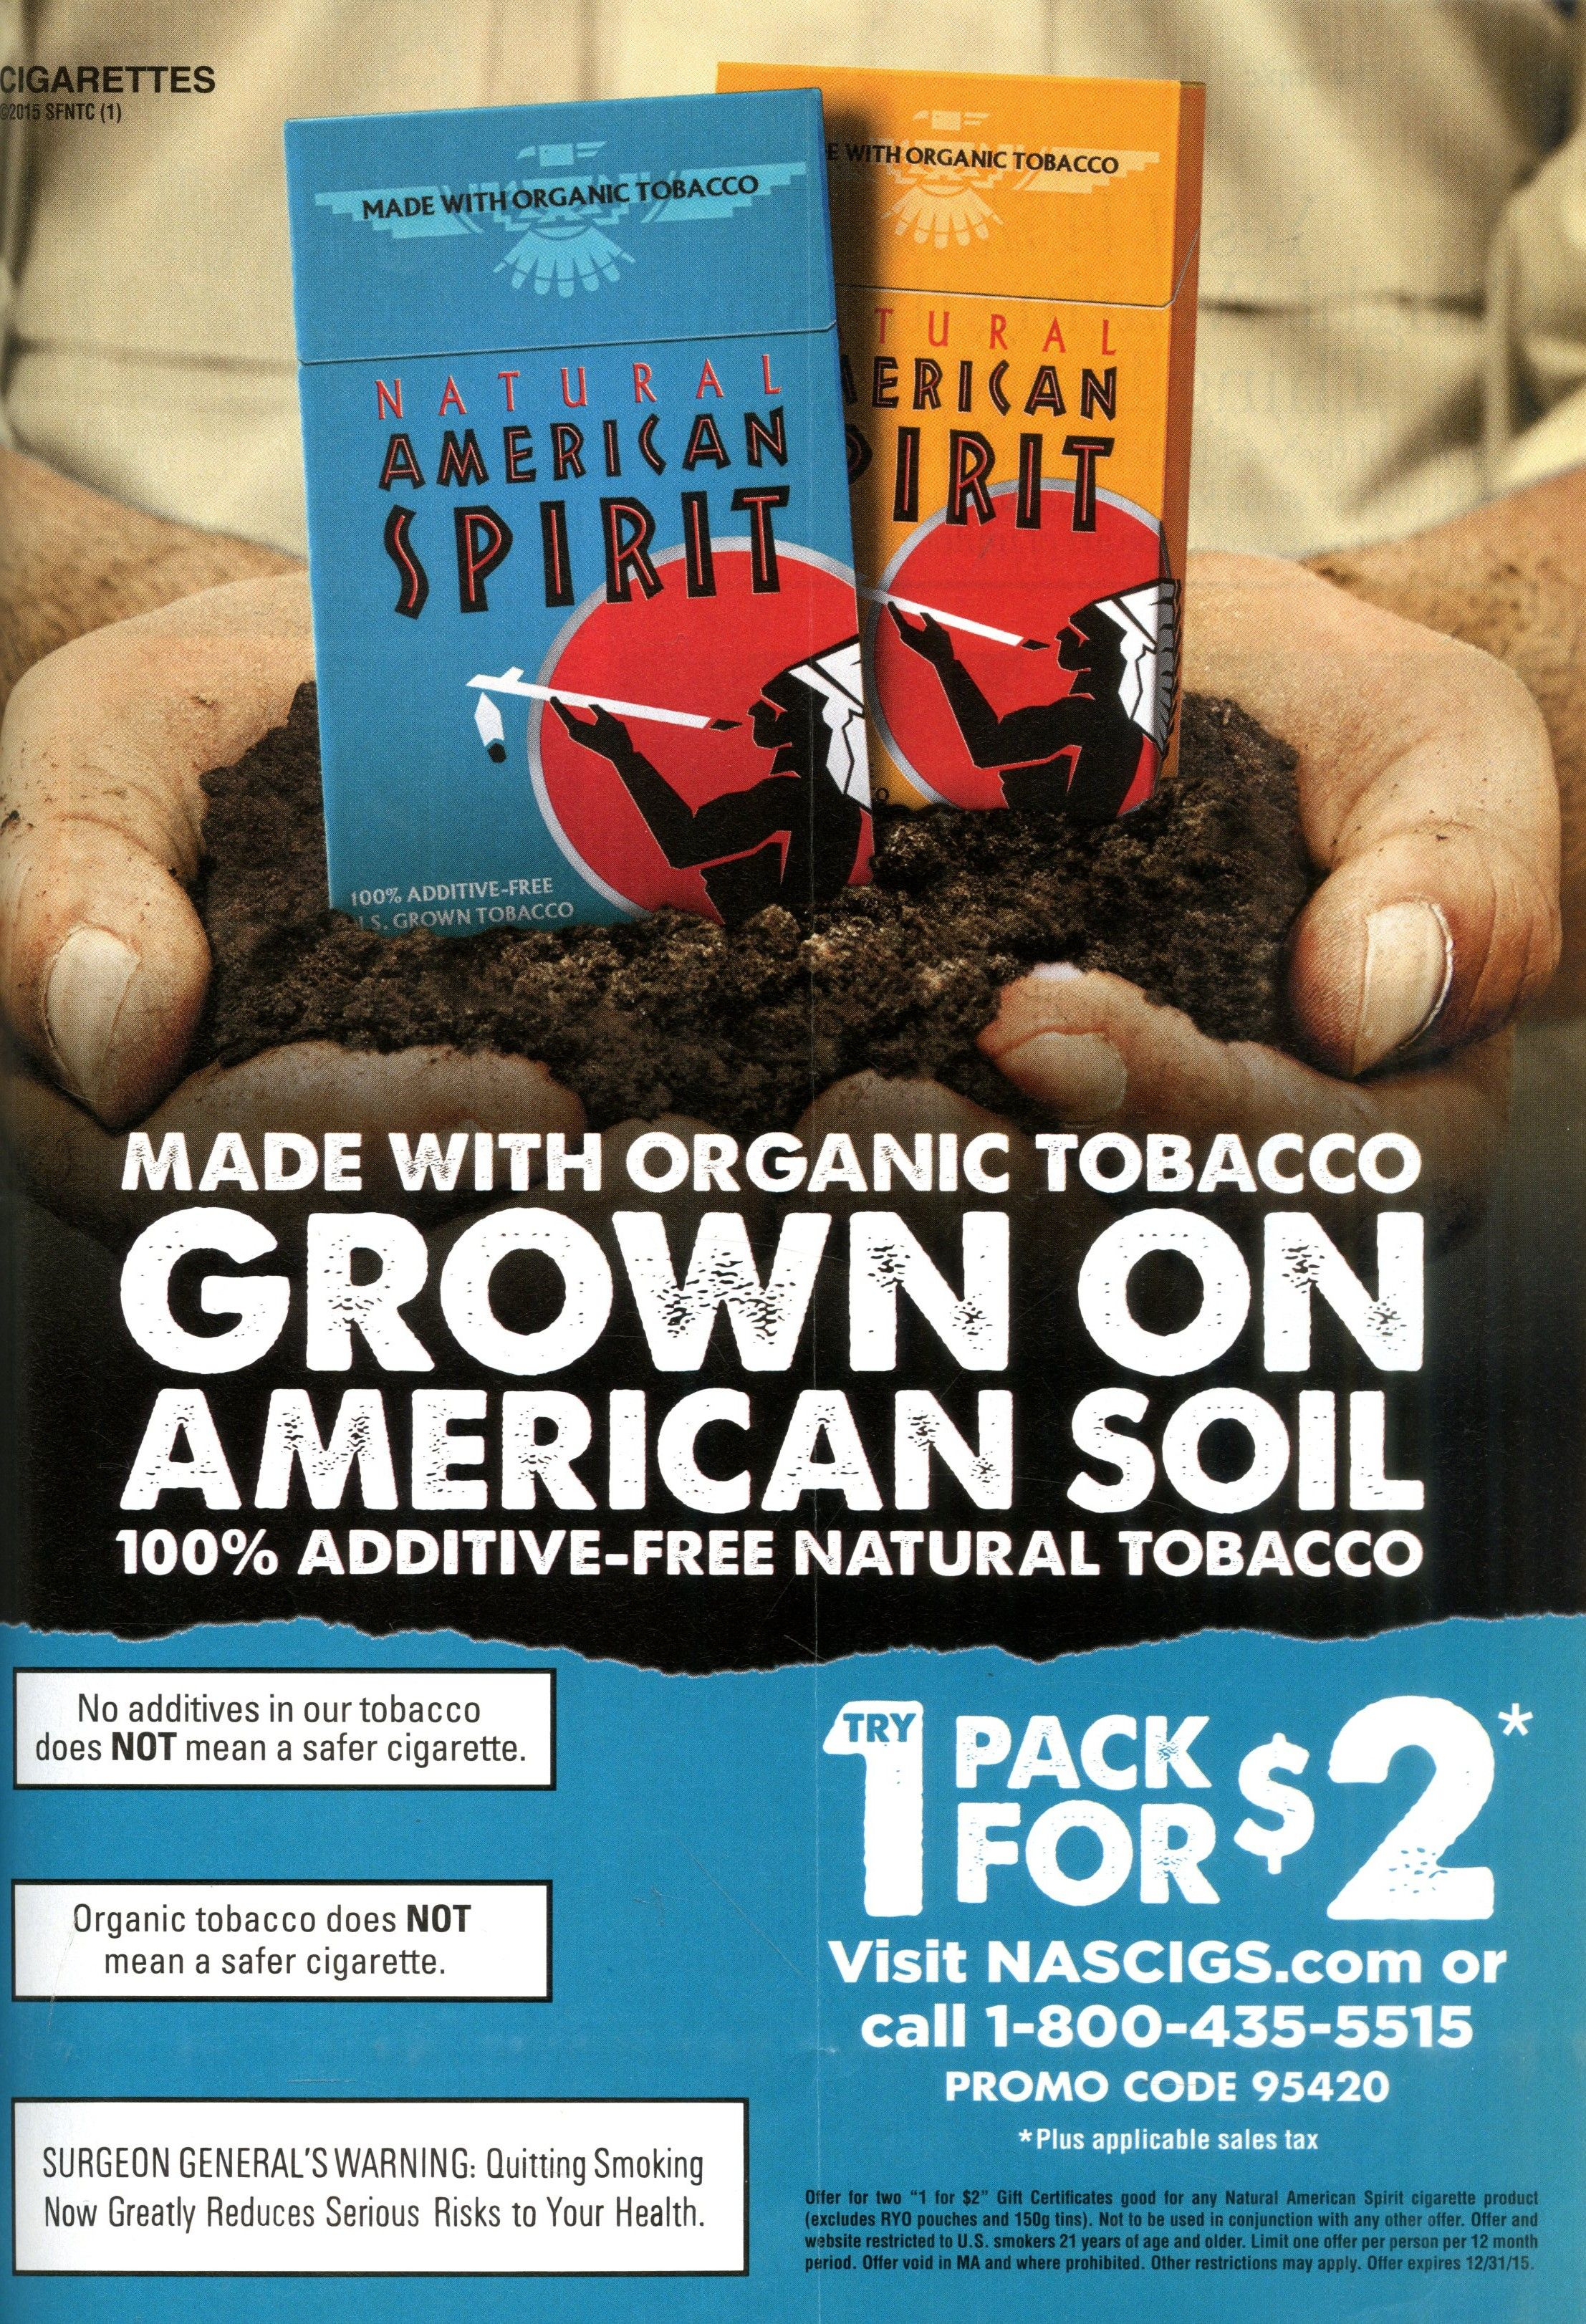 8. Natural American Spirit Cigarettes Source: Glamour, Mar. 2015 - Free Printable Newport Cigarette Coupons